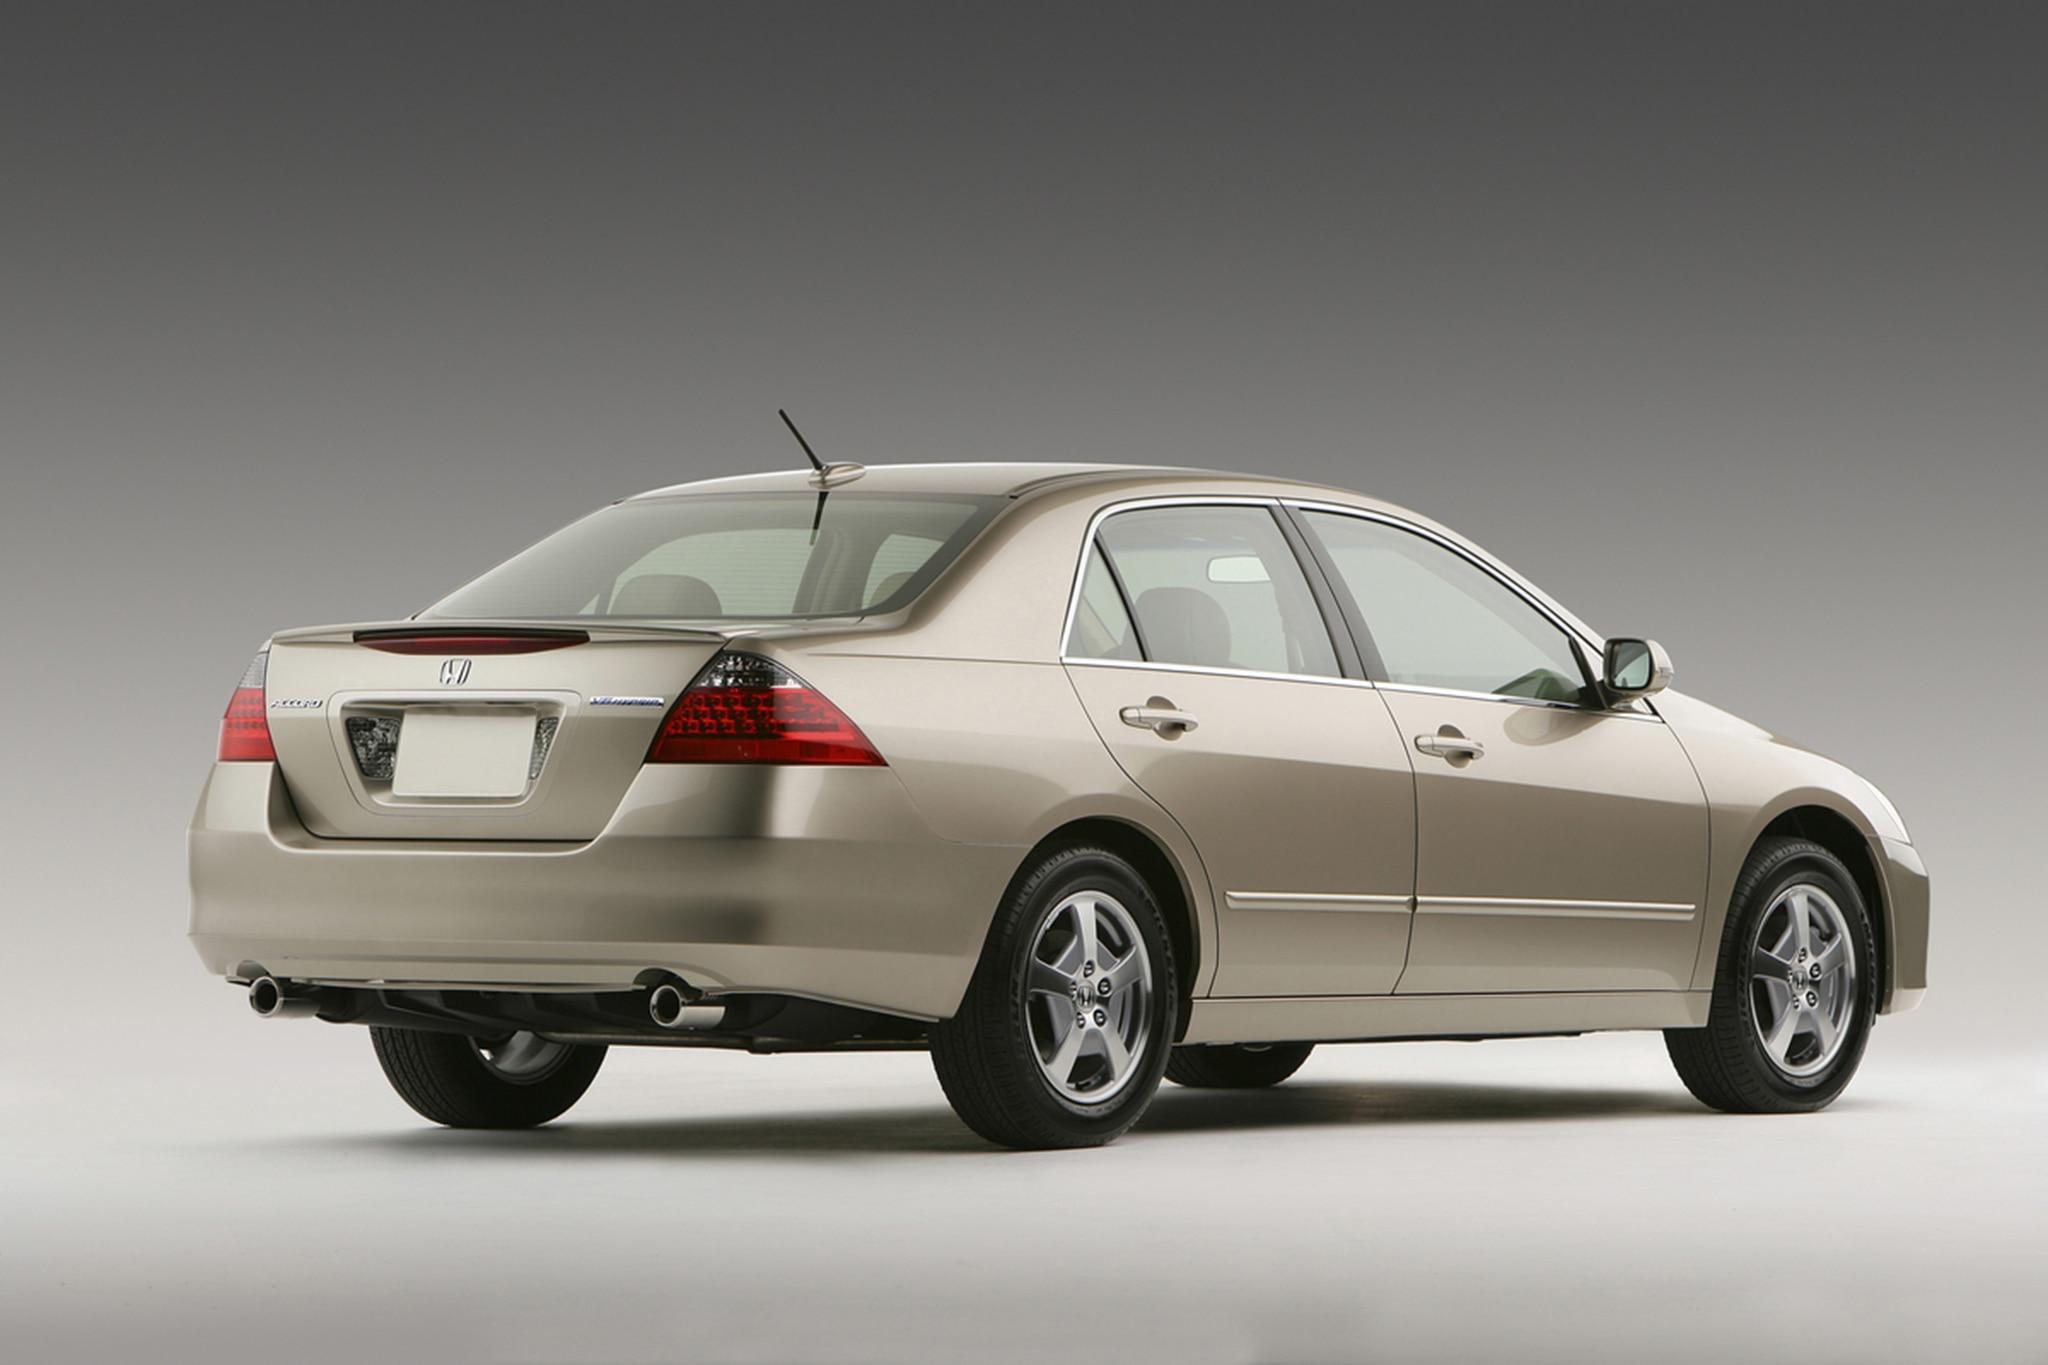 2006 Honda Accord Hybrid 7th generation